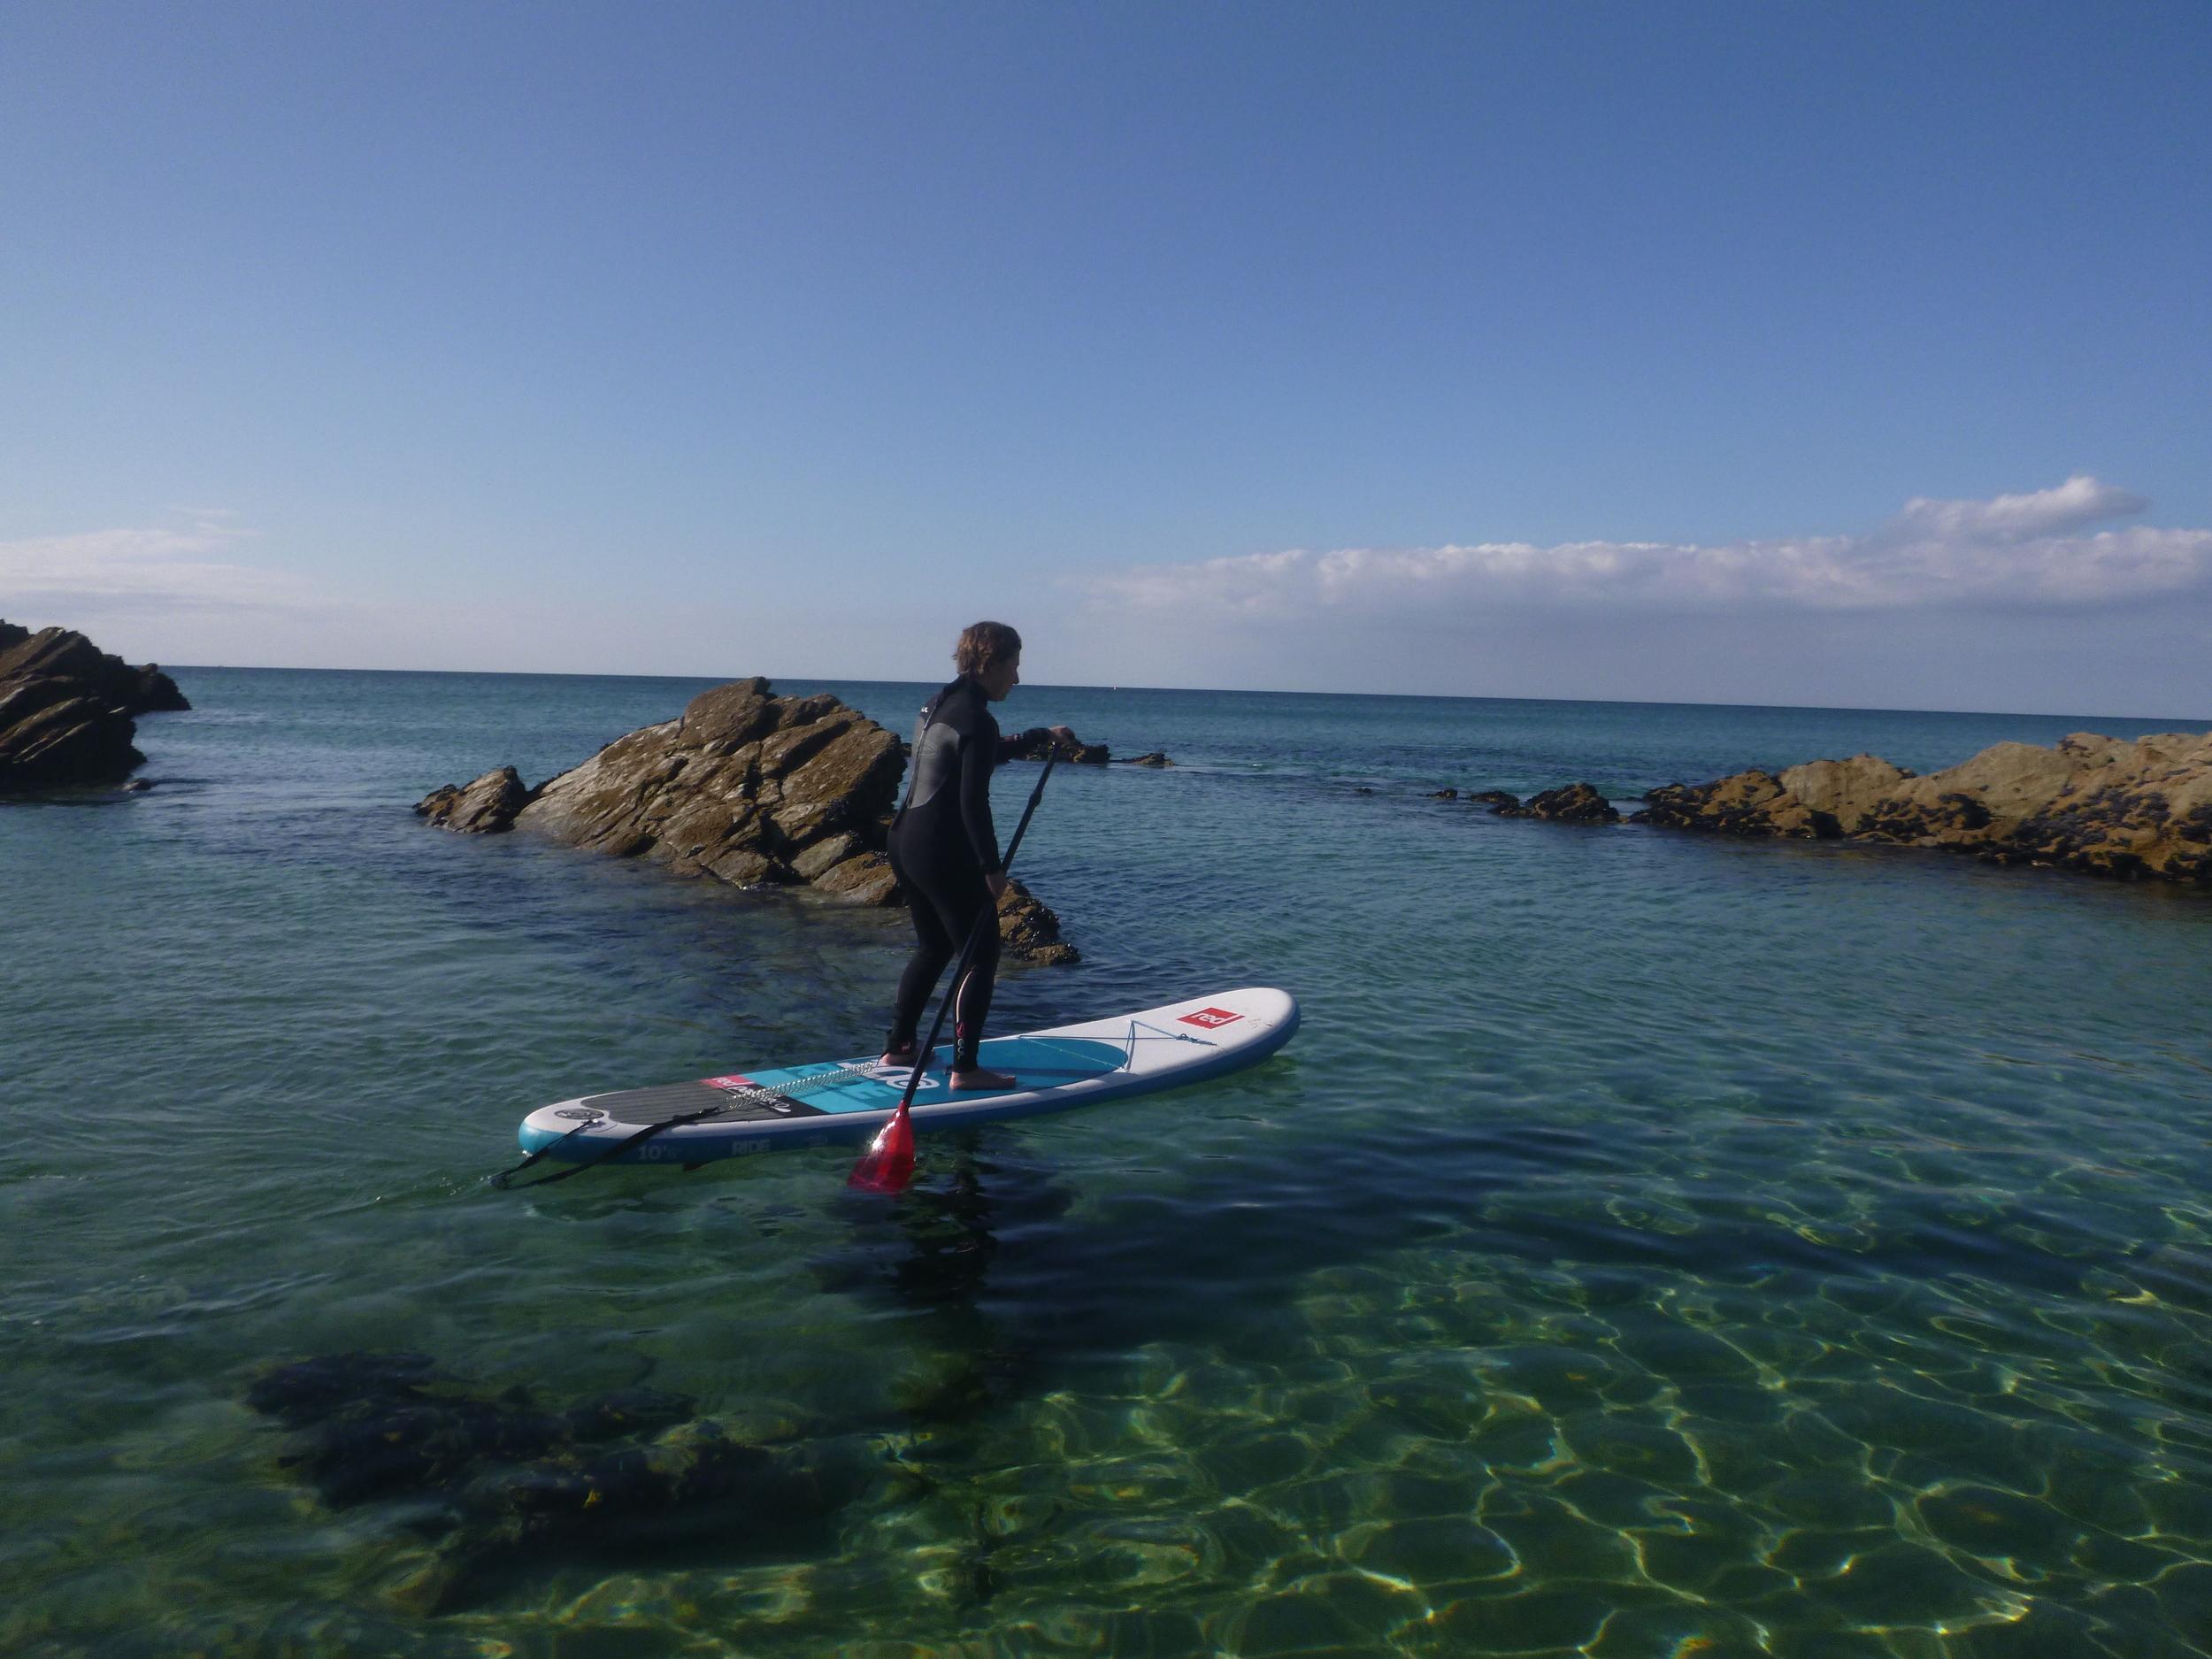 Coastal - Start to Glide